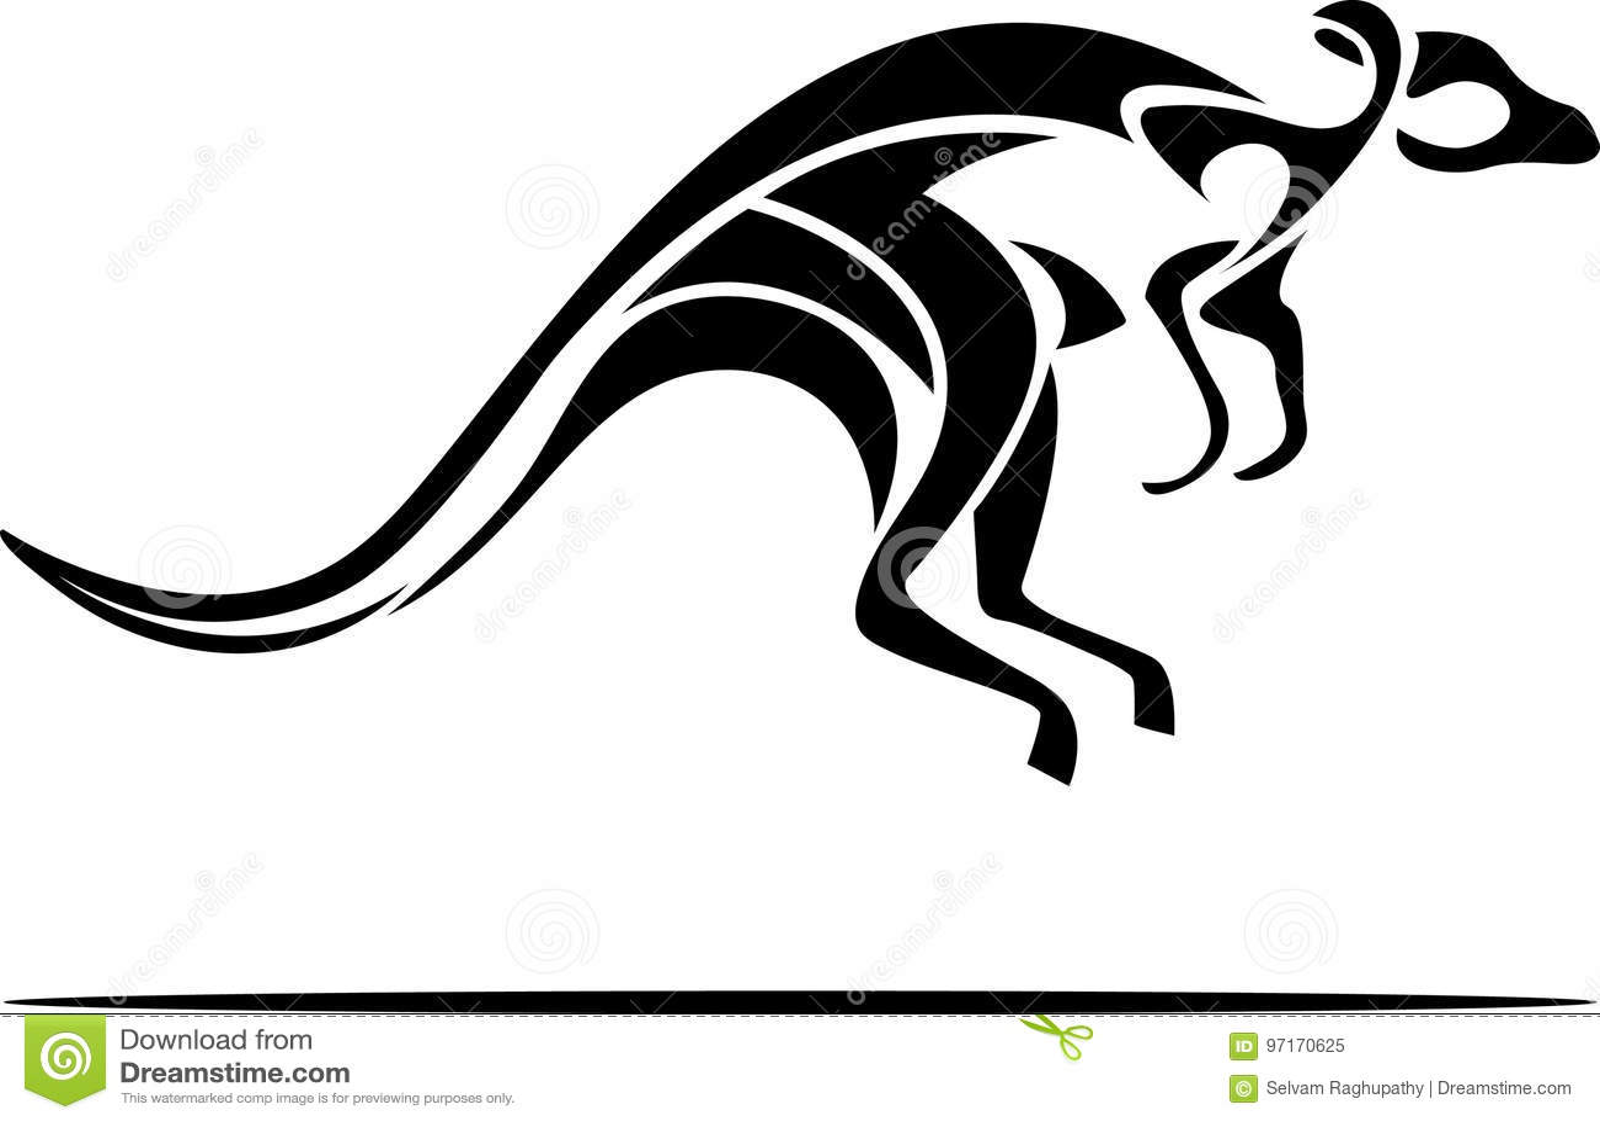 Kangaroo Abstract Stock Vector Illustration Of Clip